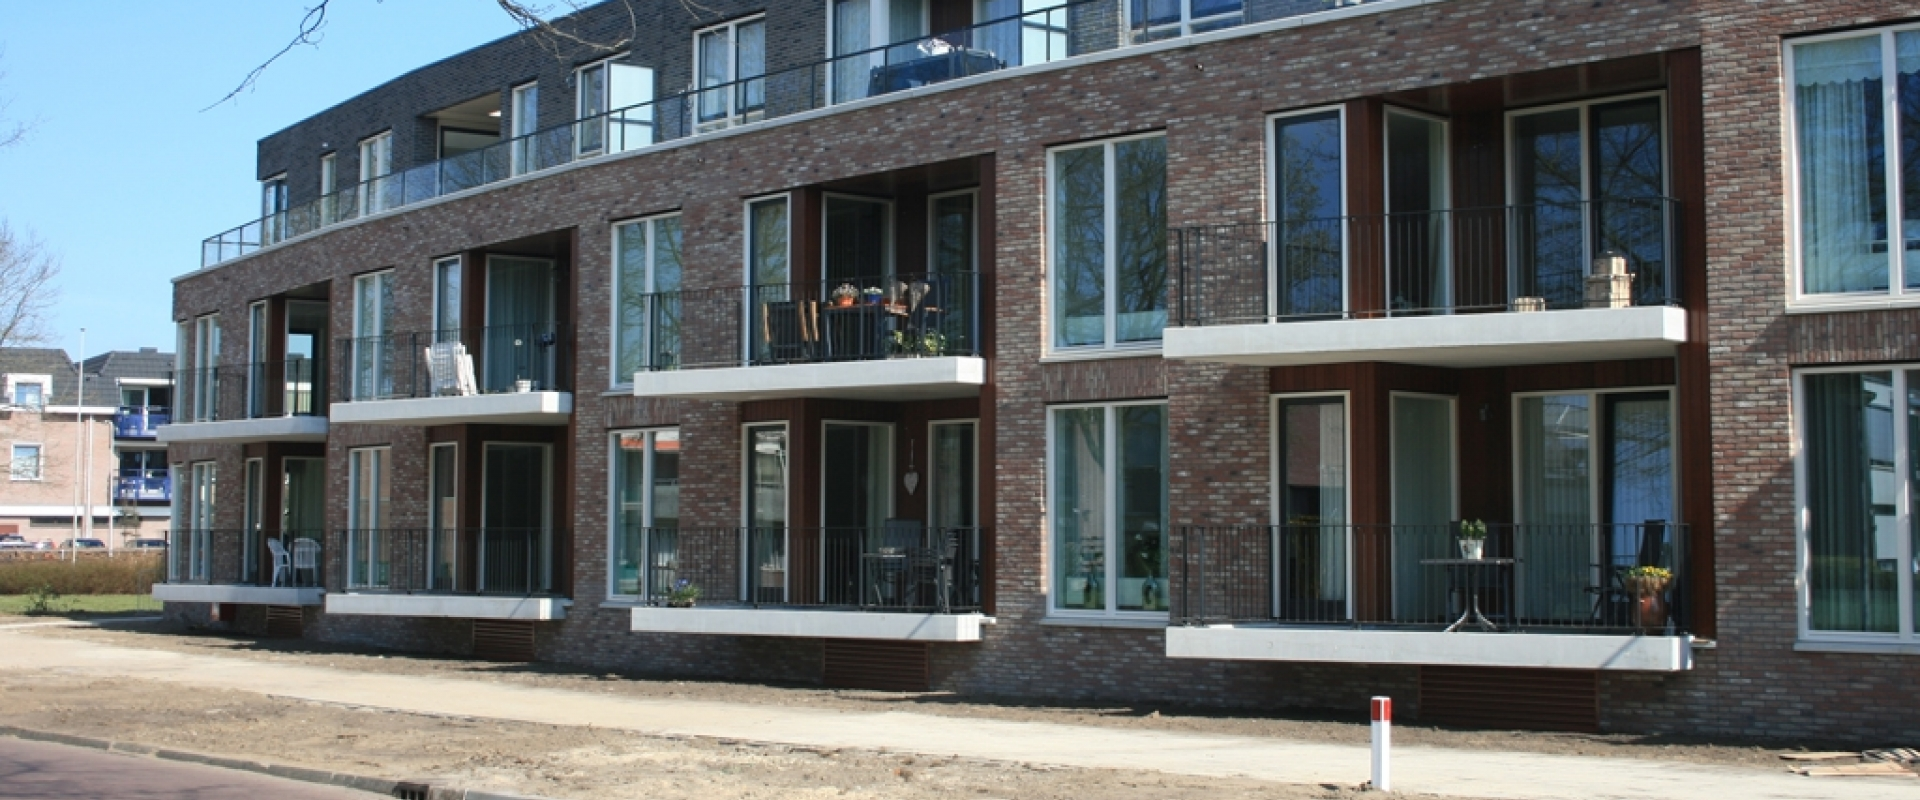 Schipperdouwesarchitectuur Optis Swwe Wierden 20